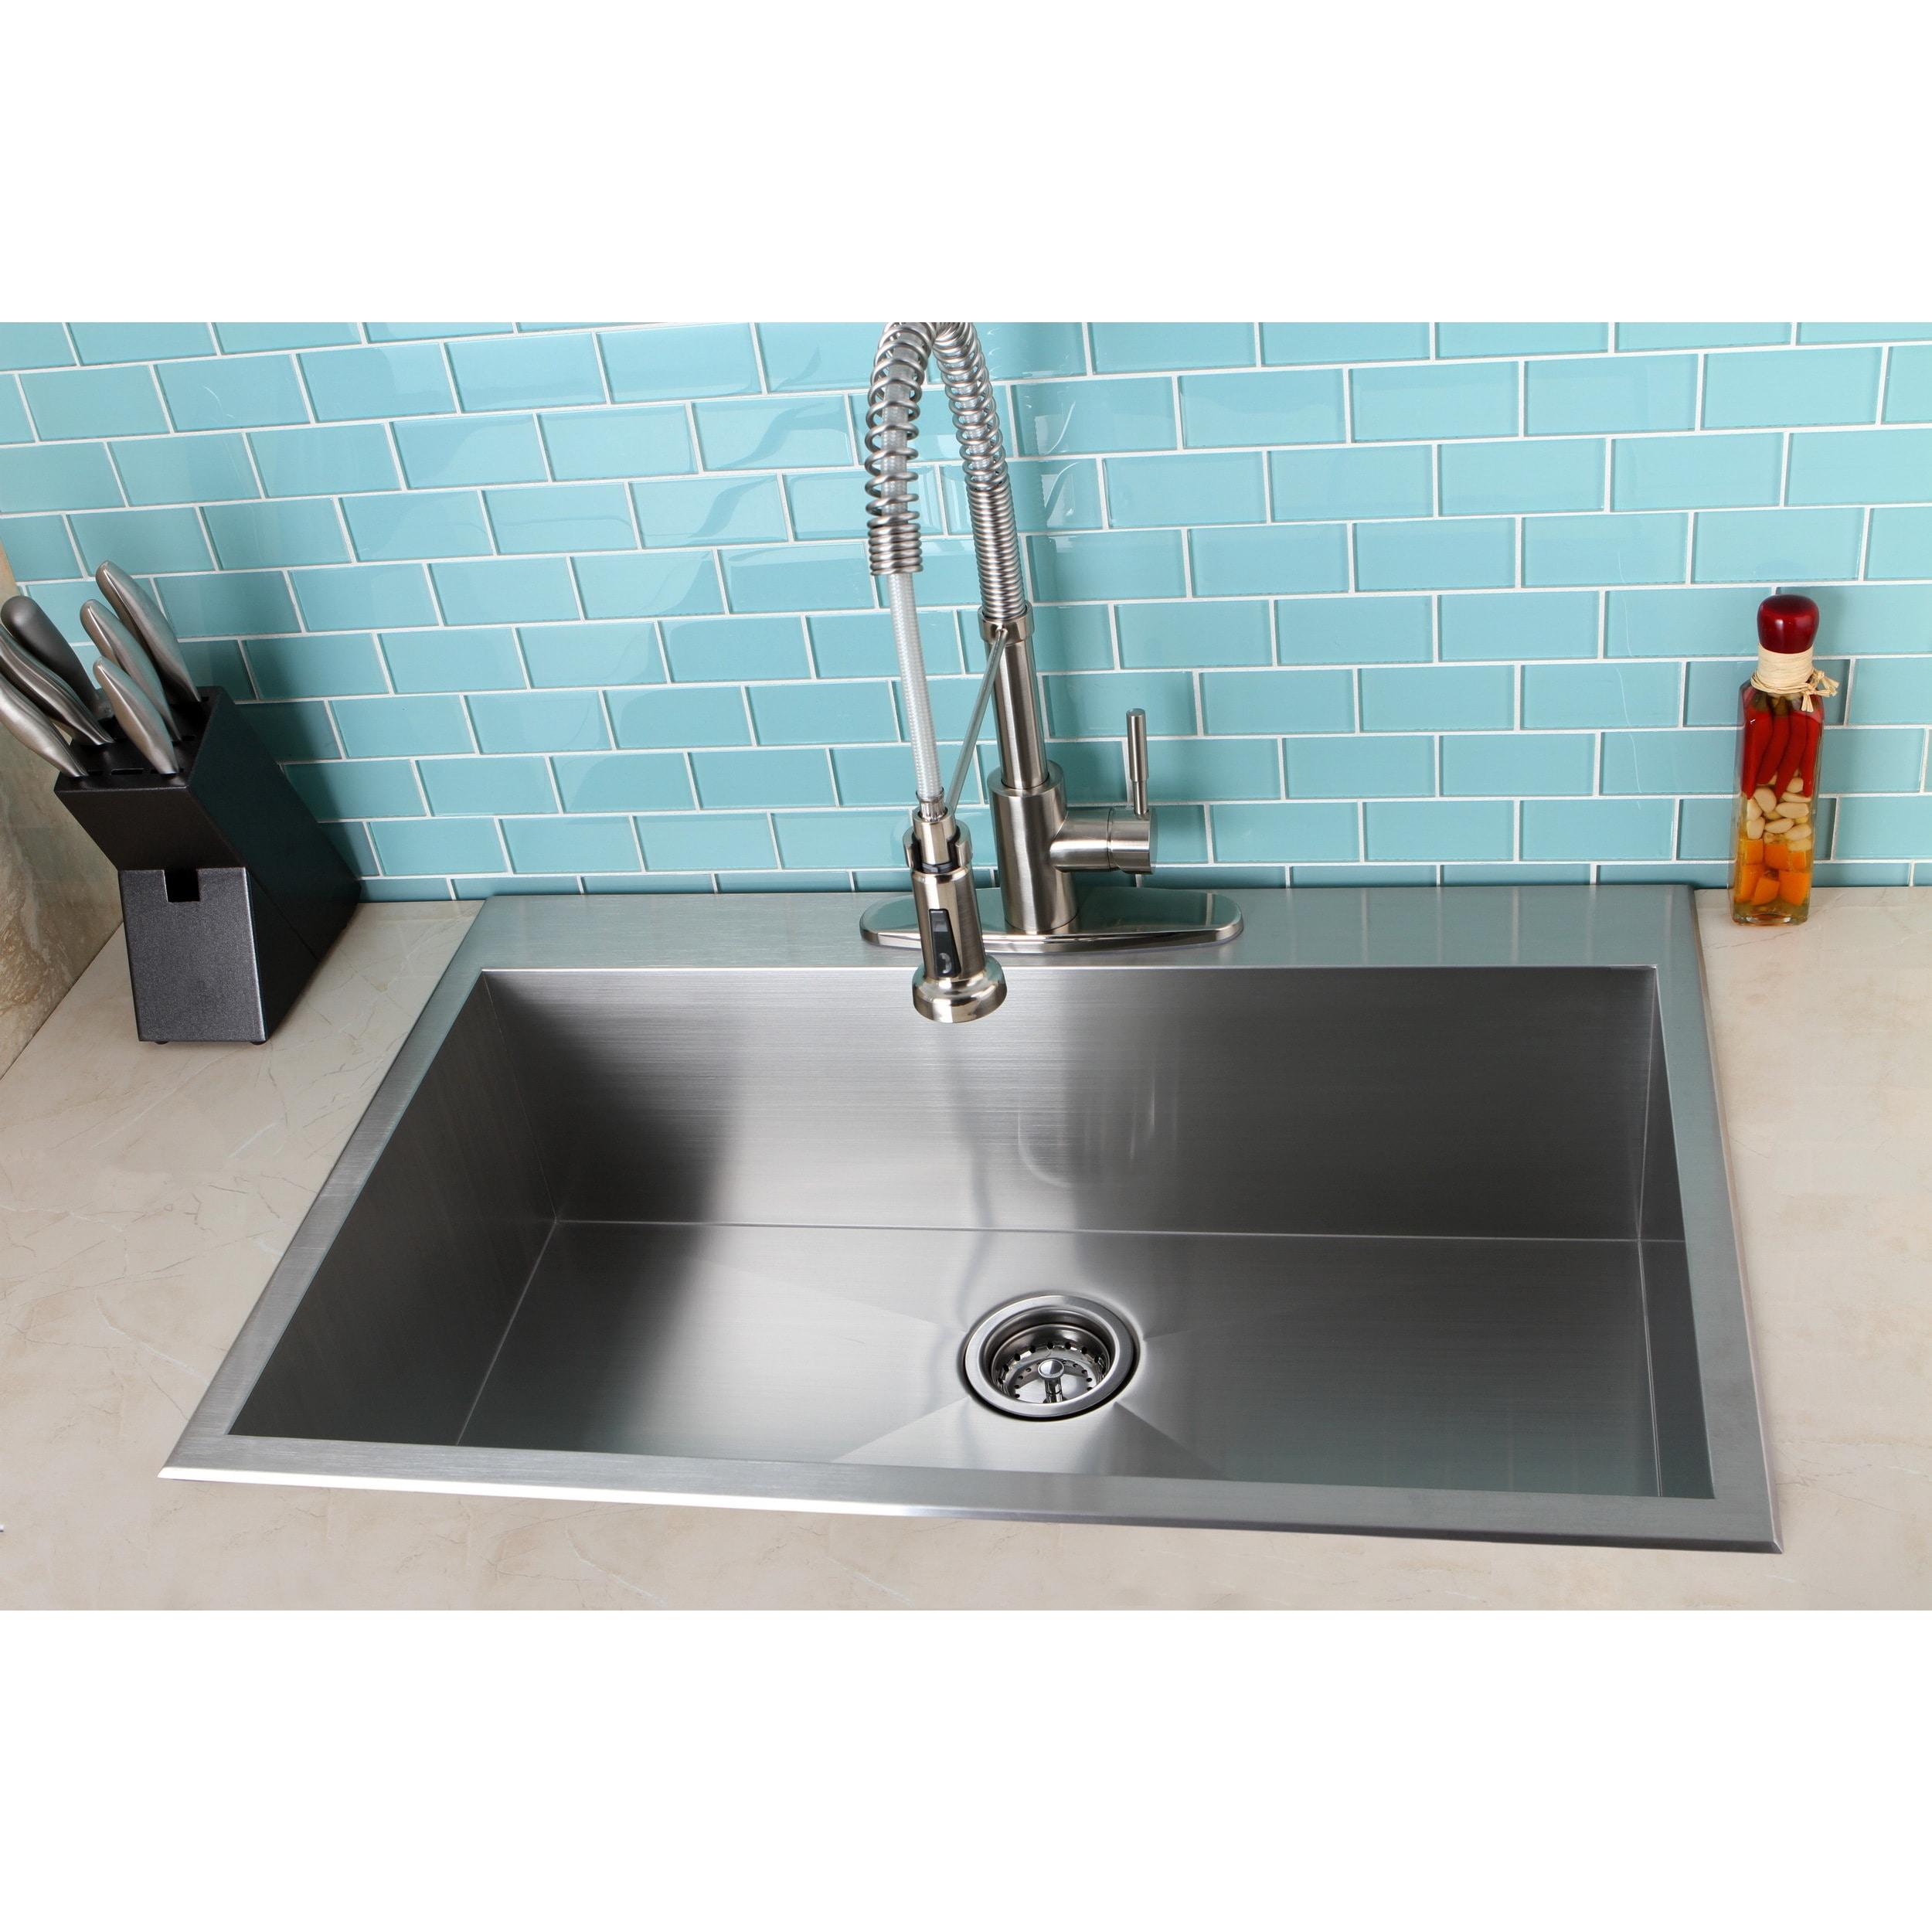 Topmount 33-inch Single Bowl Stainless Steel Kitchen Sink - Free ...